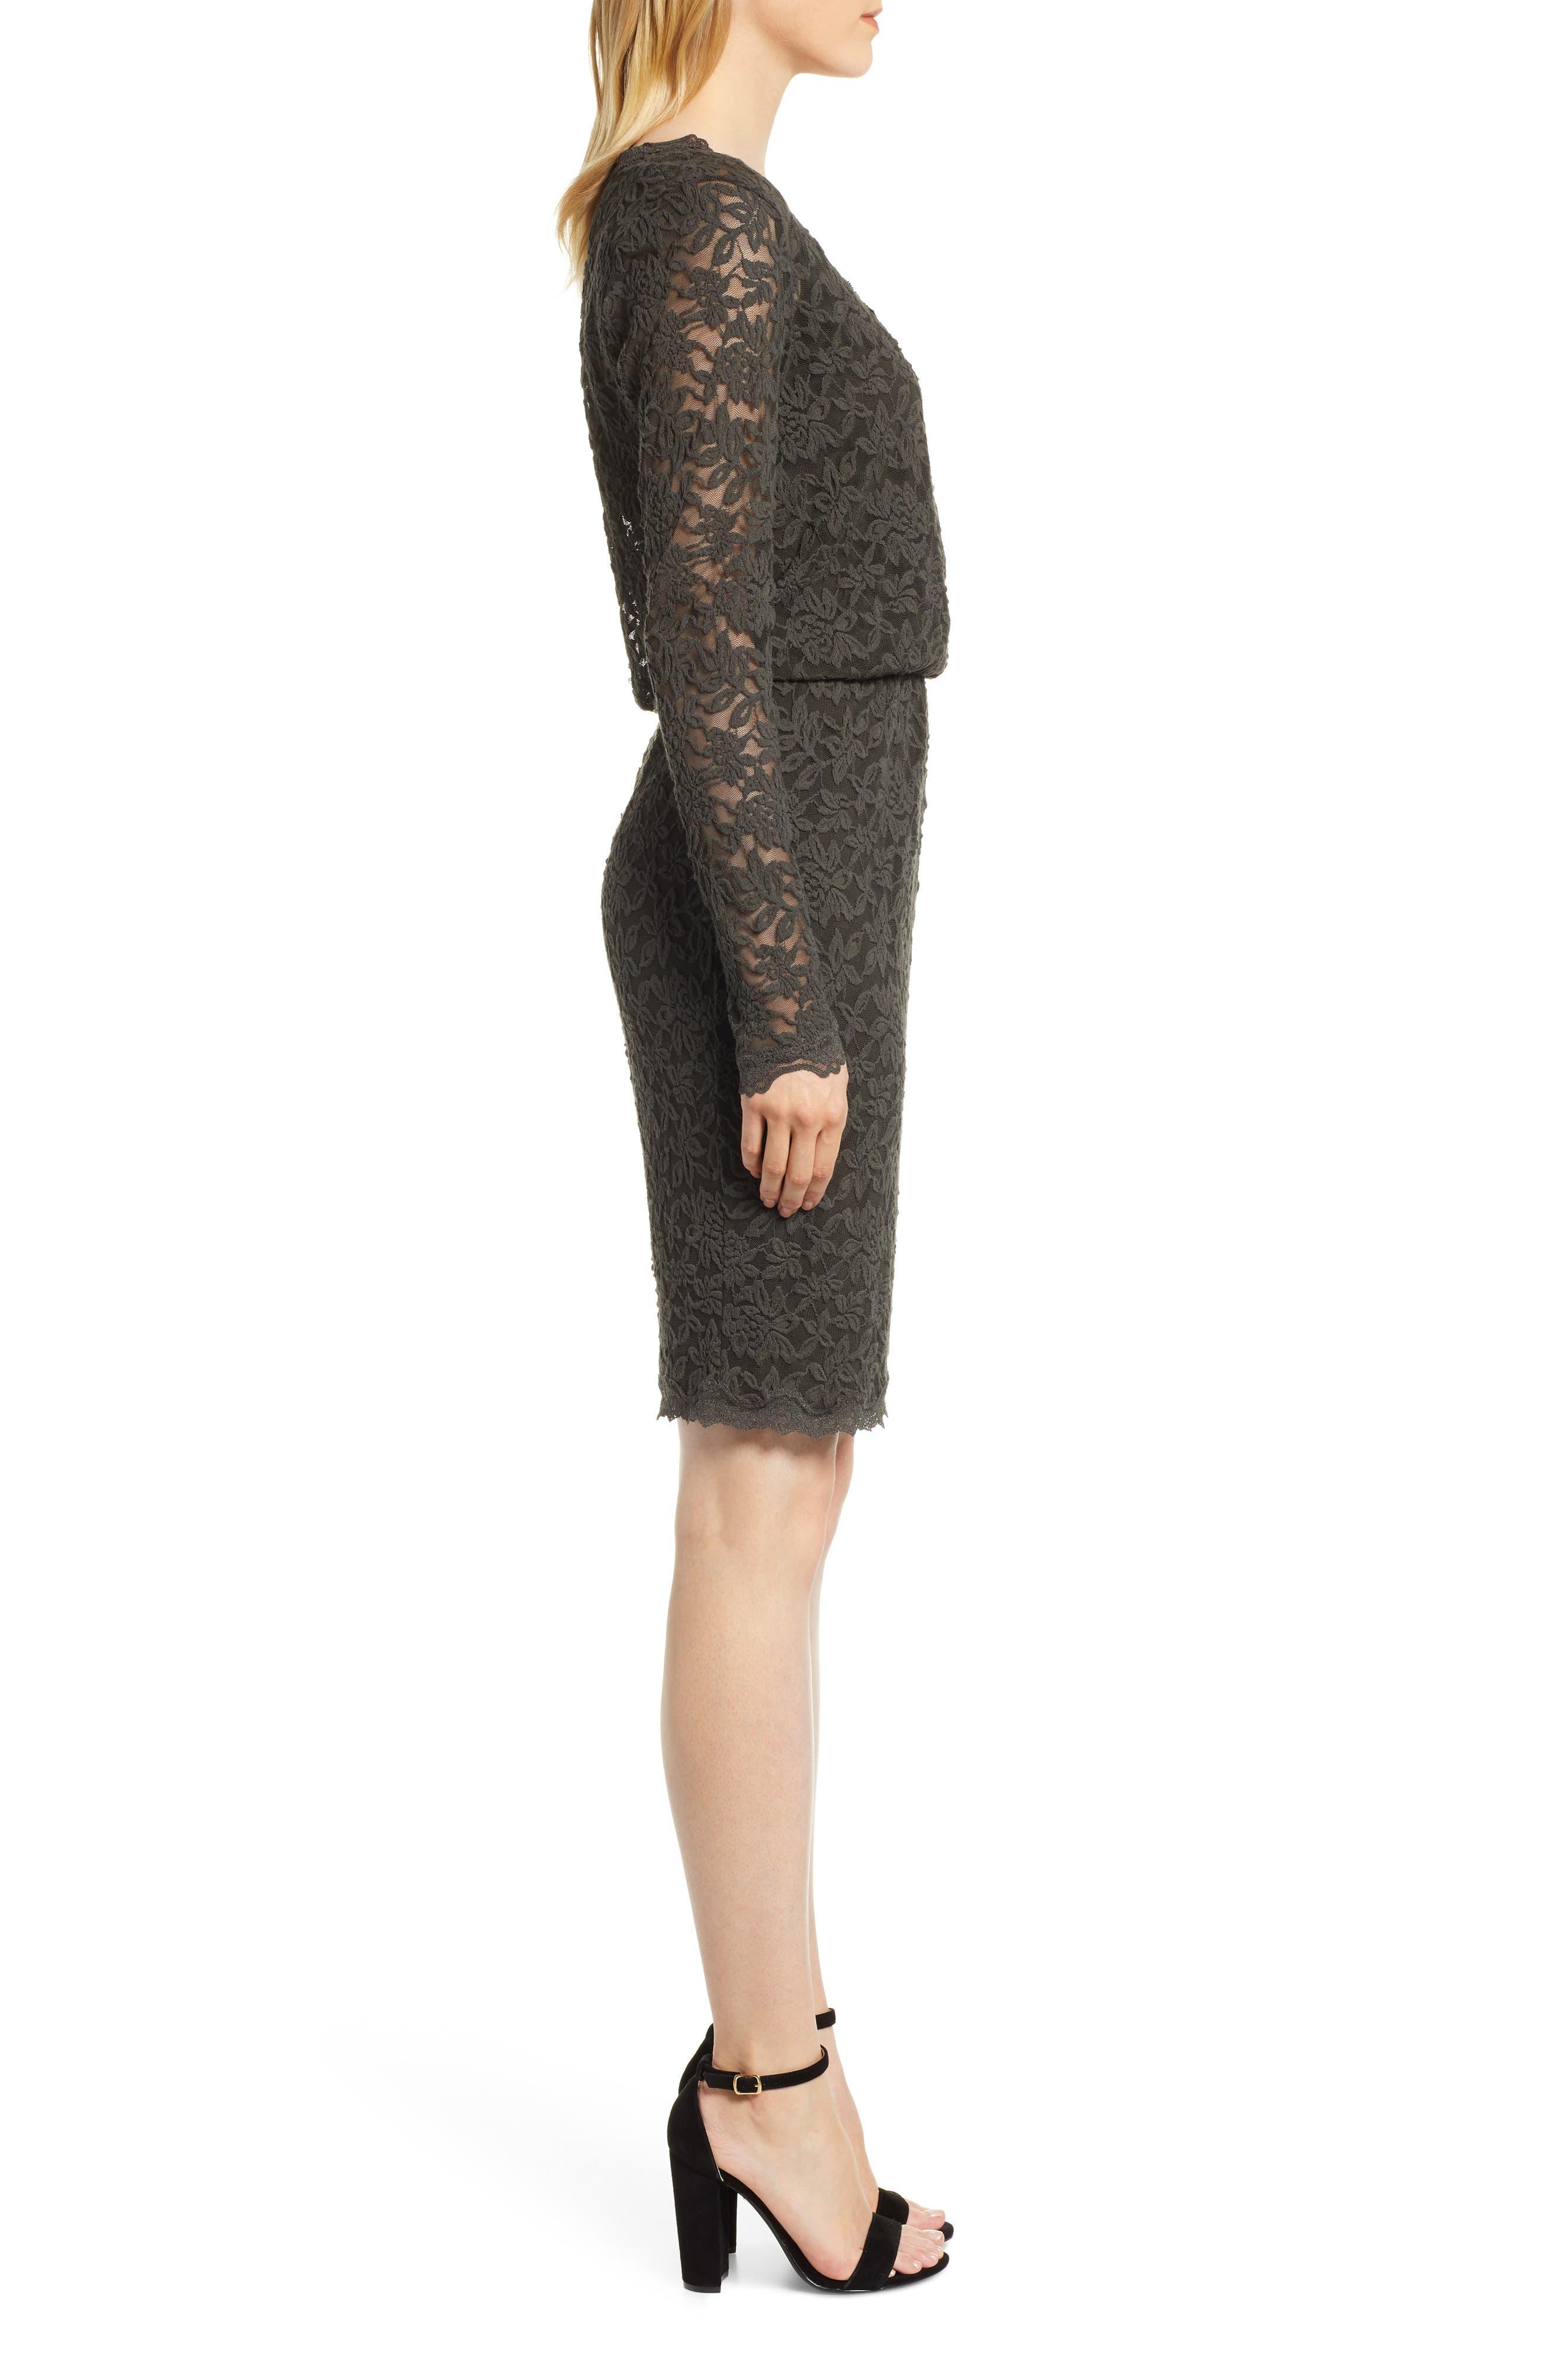 ROSEMUNDE, Delicia Scallop Detail Cotton Blend Lace Dress, Alternate thumbnail 4, color, DARK FOREST